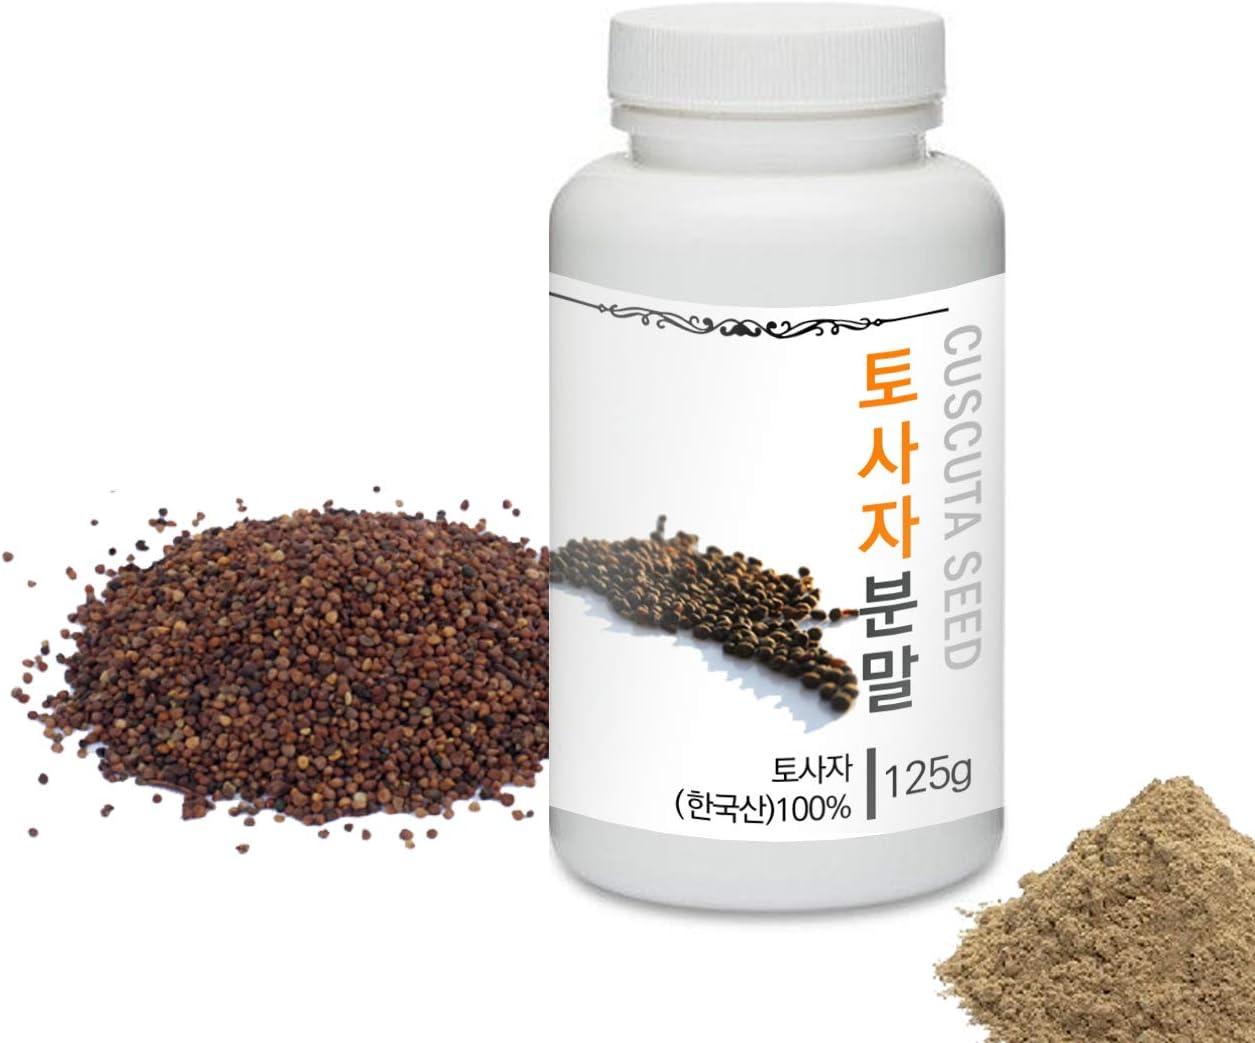 [Medicinal Herbal Powder] Prince Natural Cuscuta Seed Powder/프린스 토사자분말, 4.4oz / 125g (Cuscuta Seed/토사자)